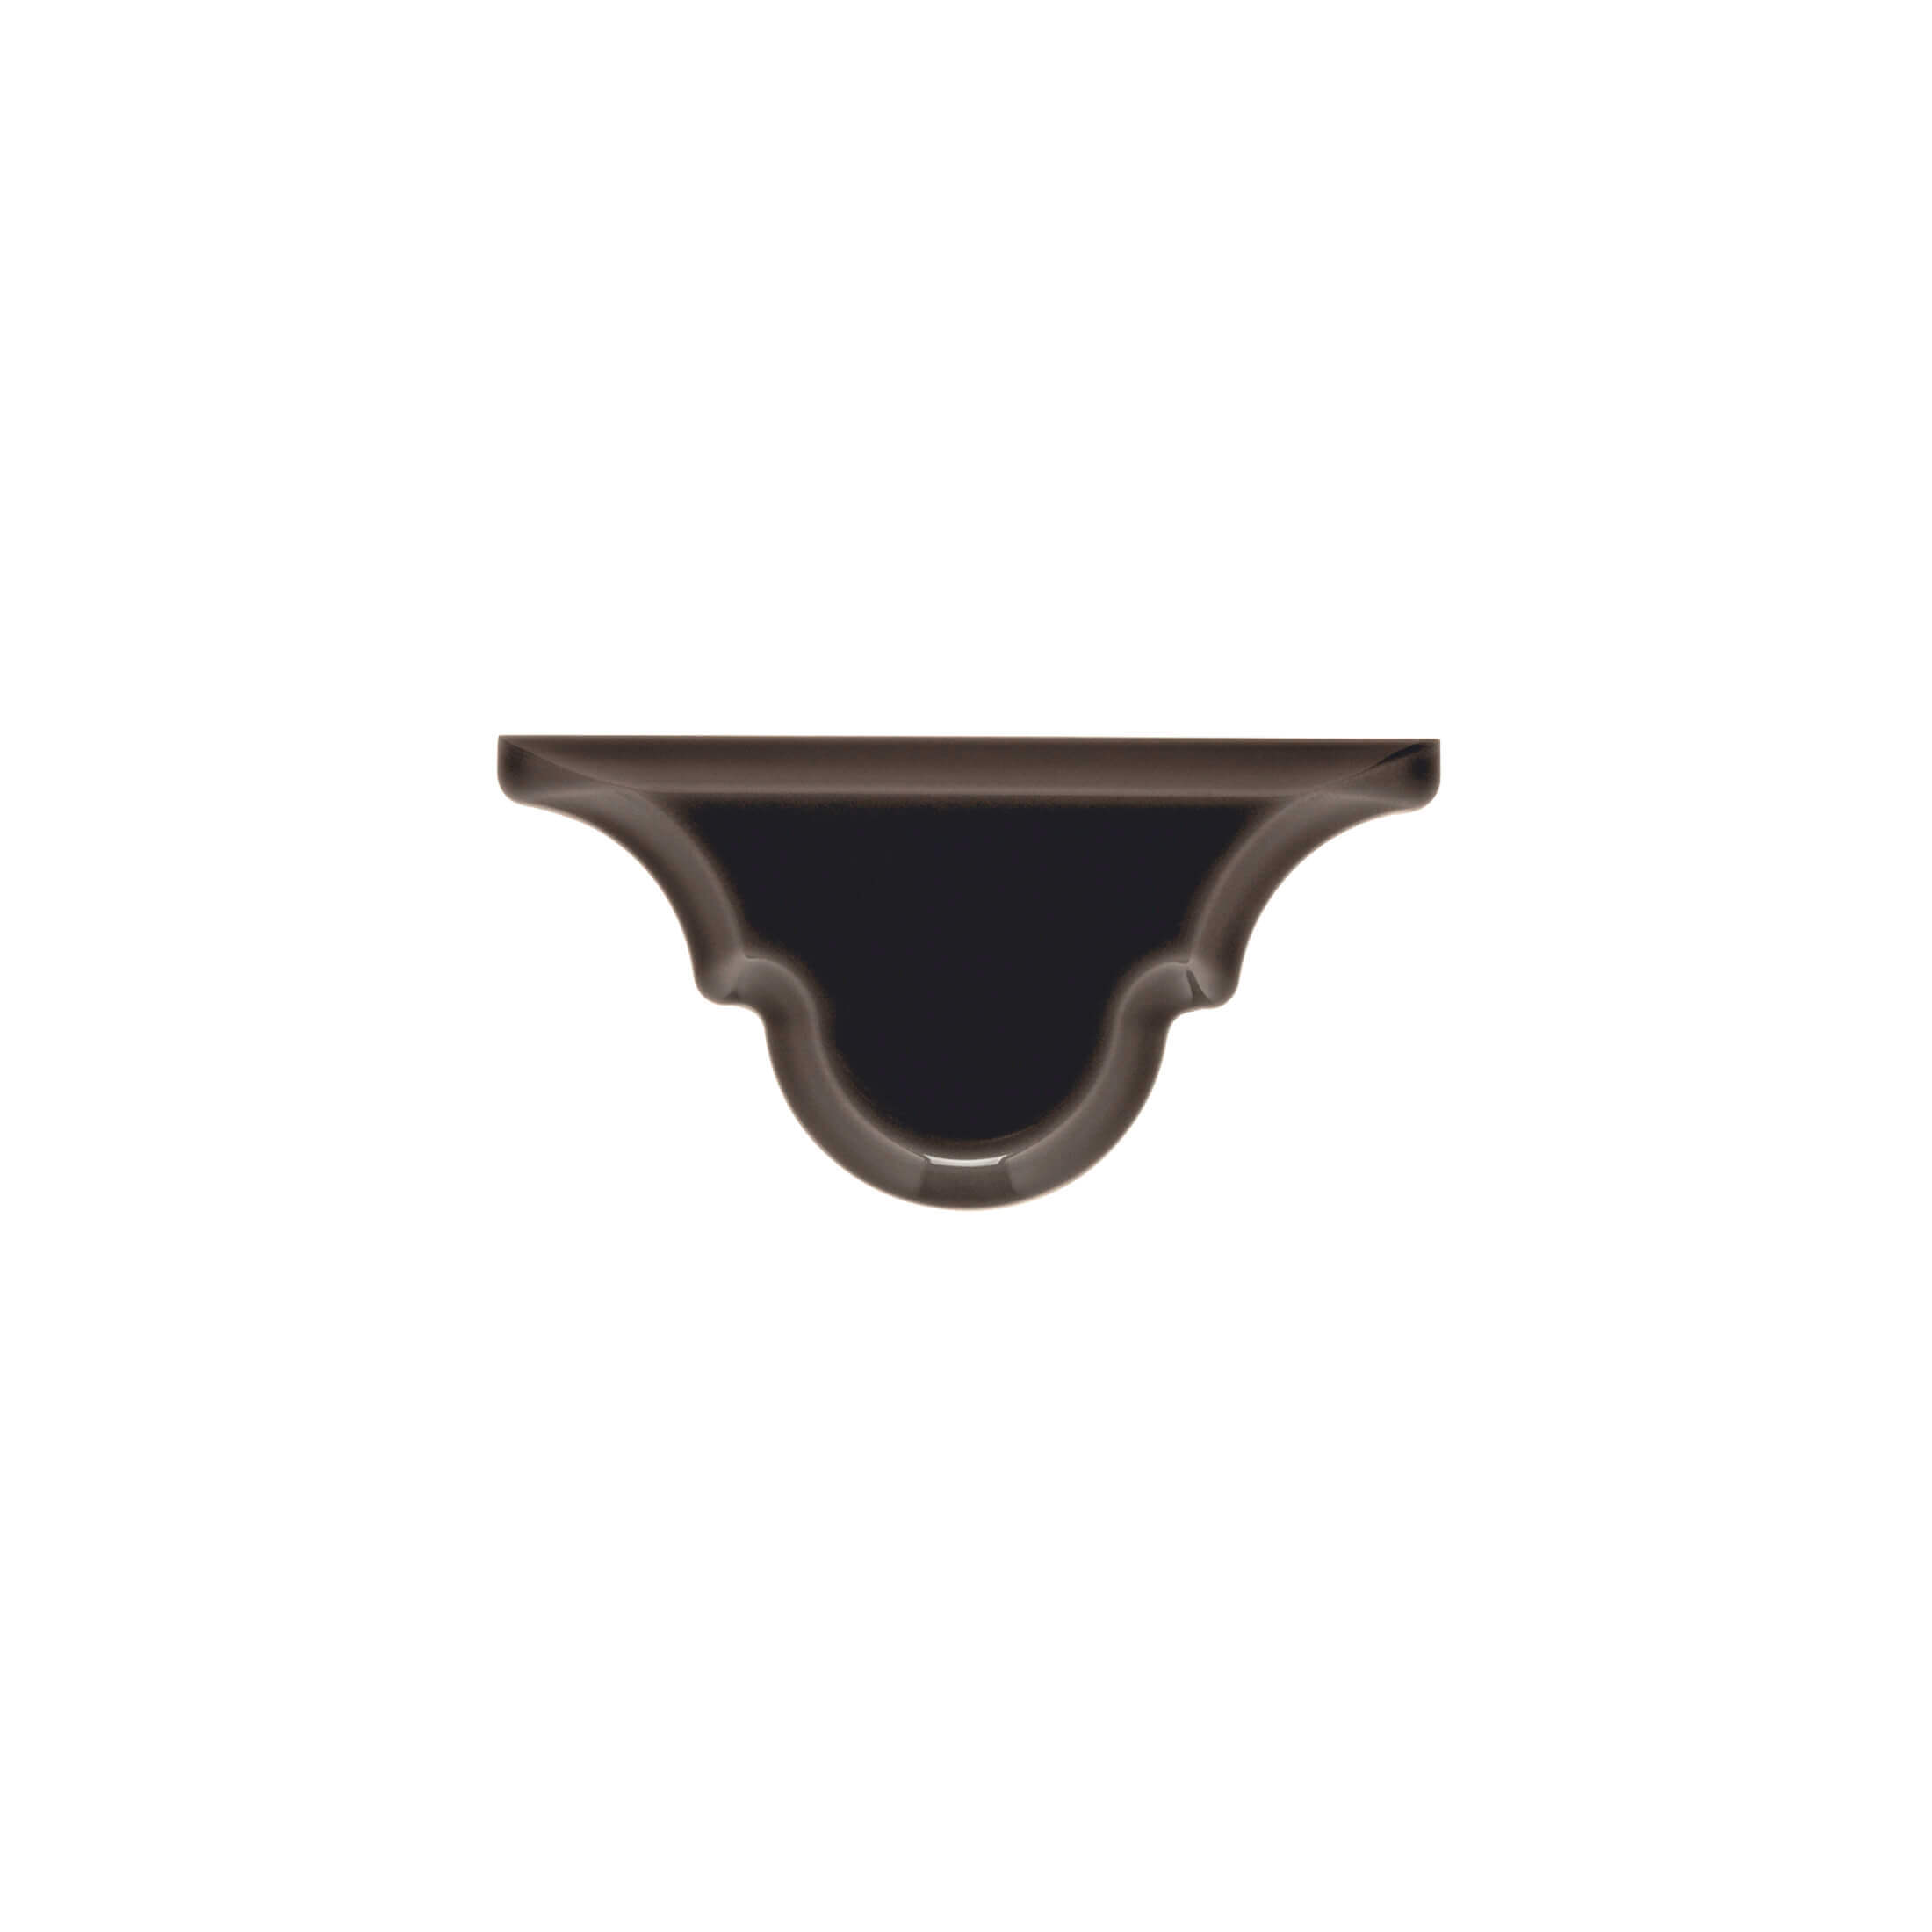 ADST8013 - ARABESCO REMATE VOLCANICO - 7.5 cm X 15 cm